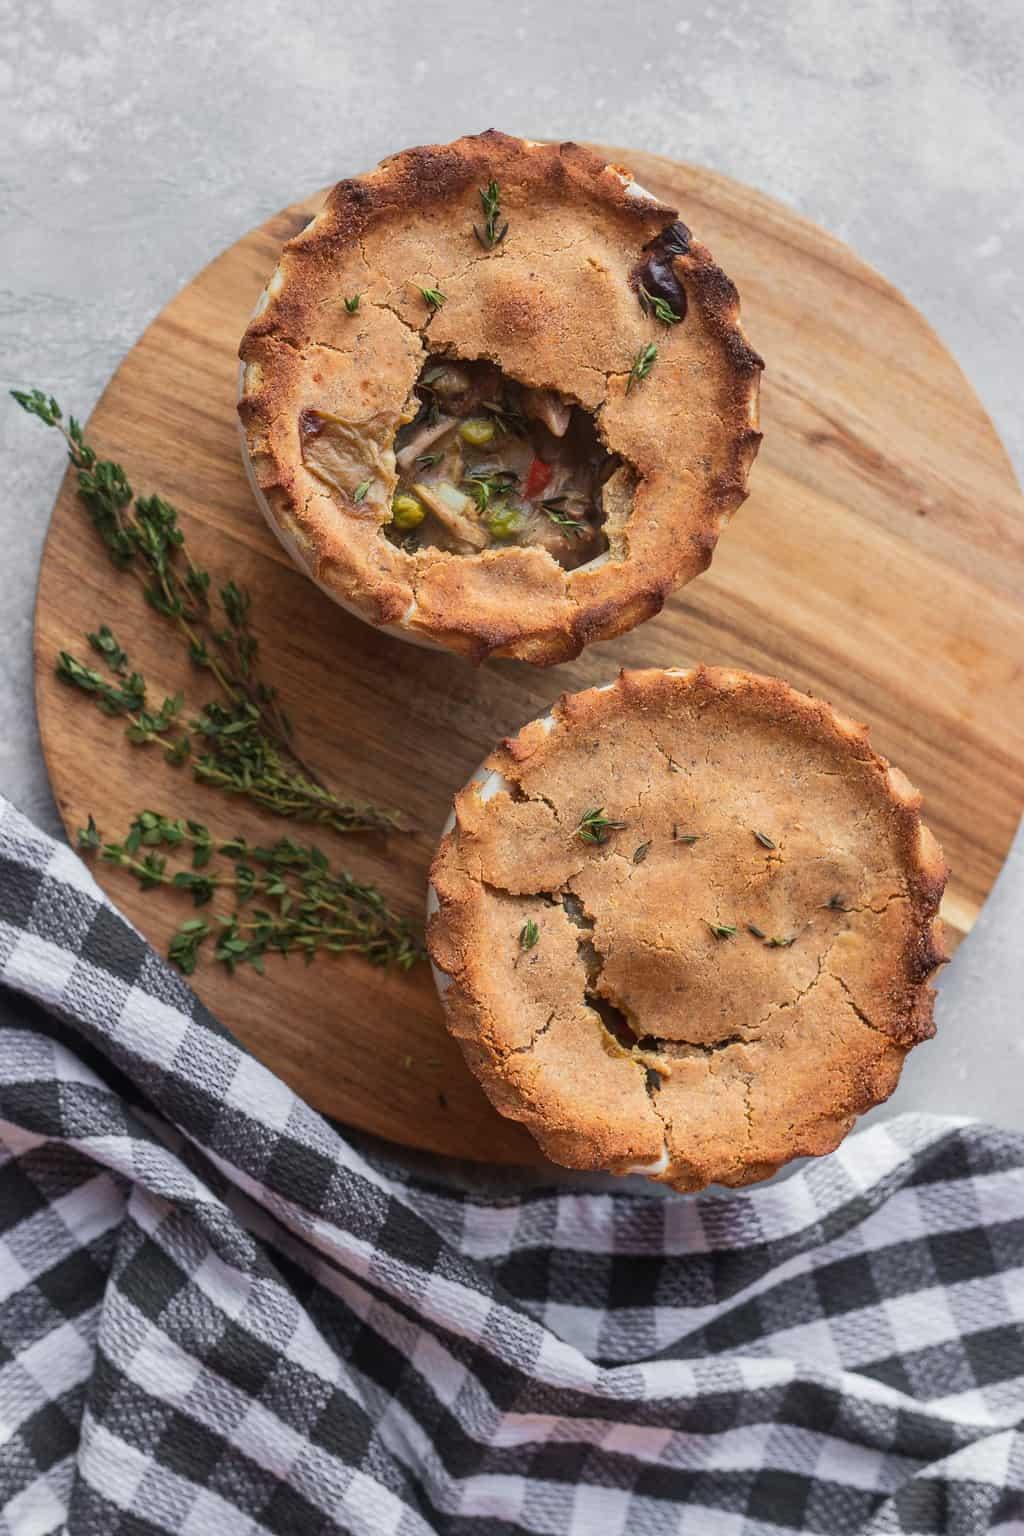 Vegan pot pies with jackfruit and gluten-free crust